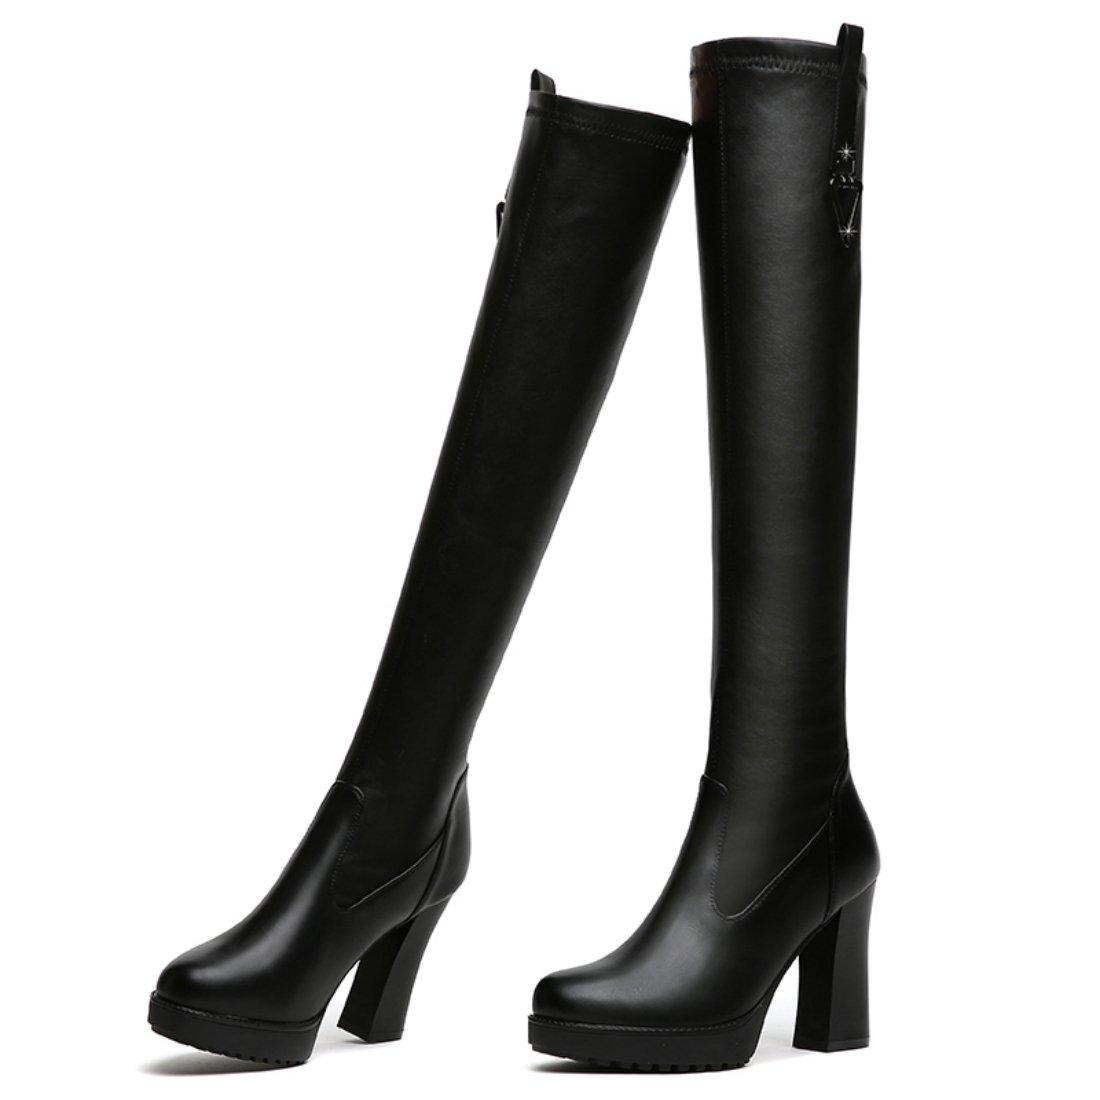 lusam feeling Womens Cambridge Knee-High Wide Calf High Heel Boot